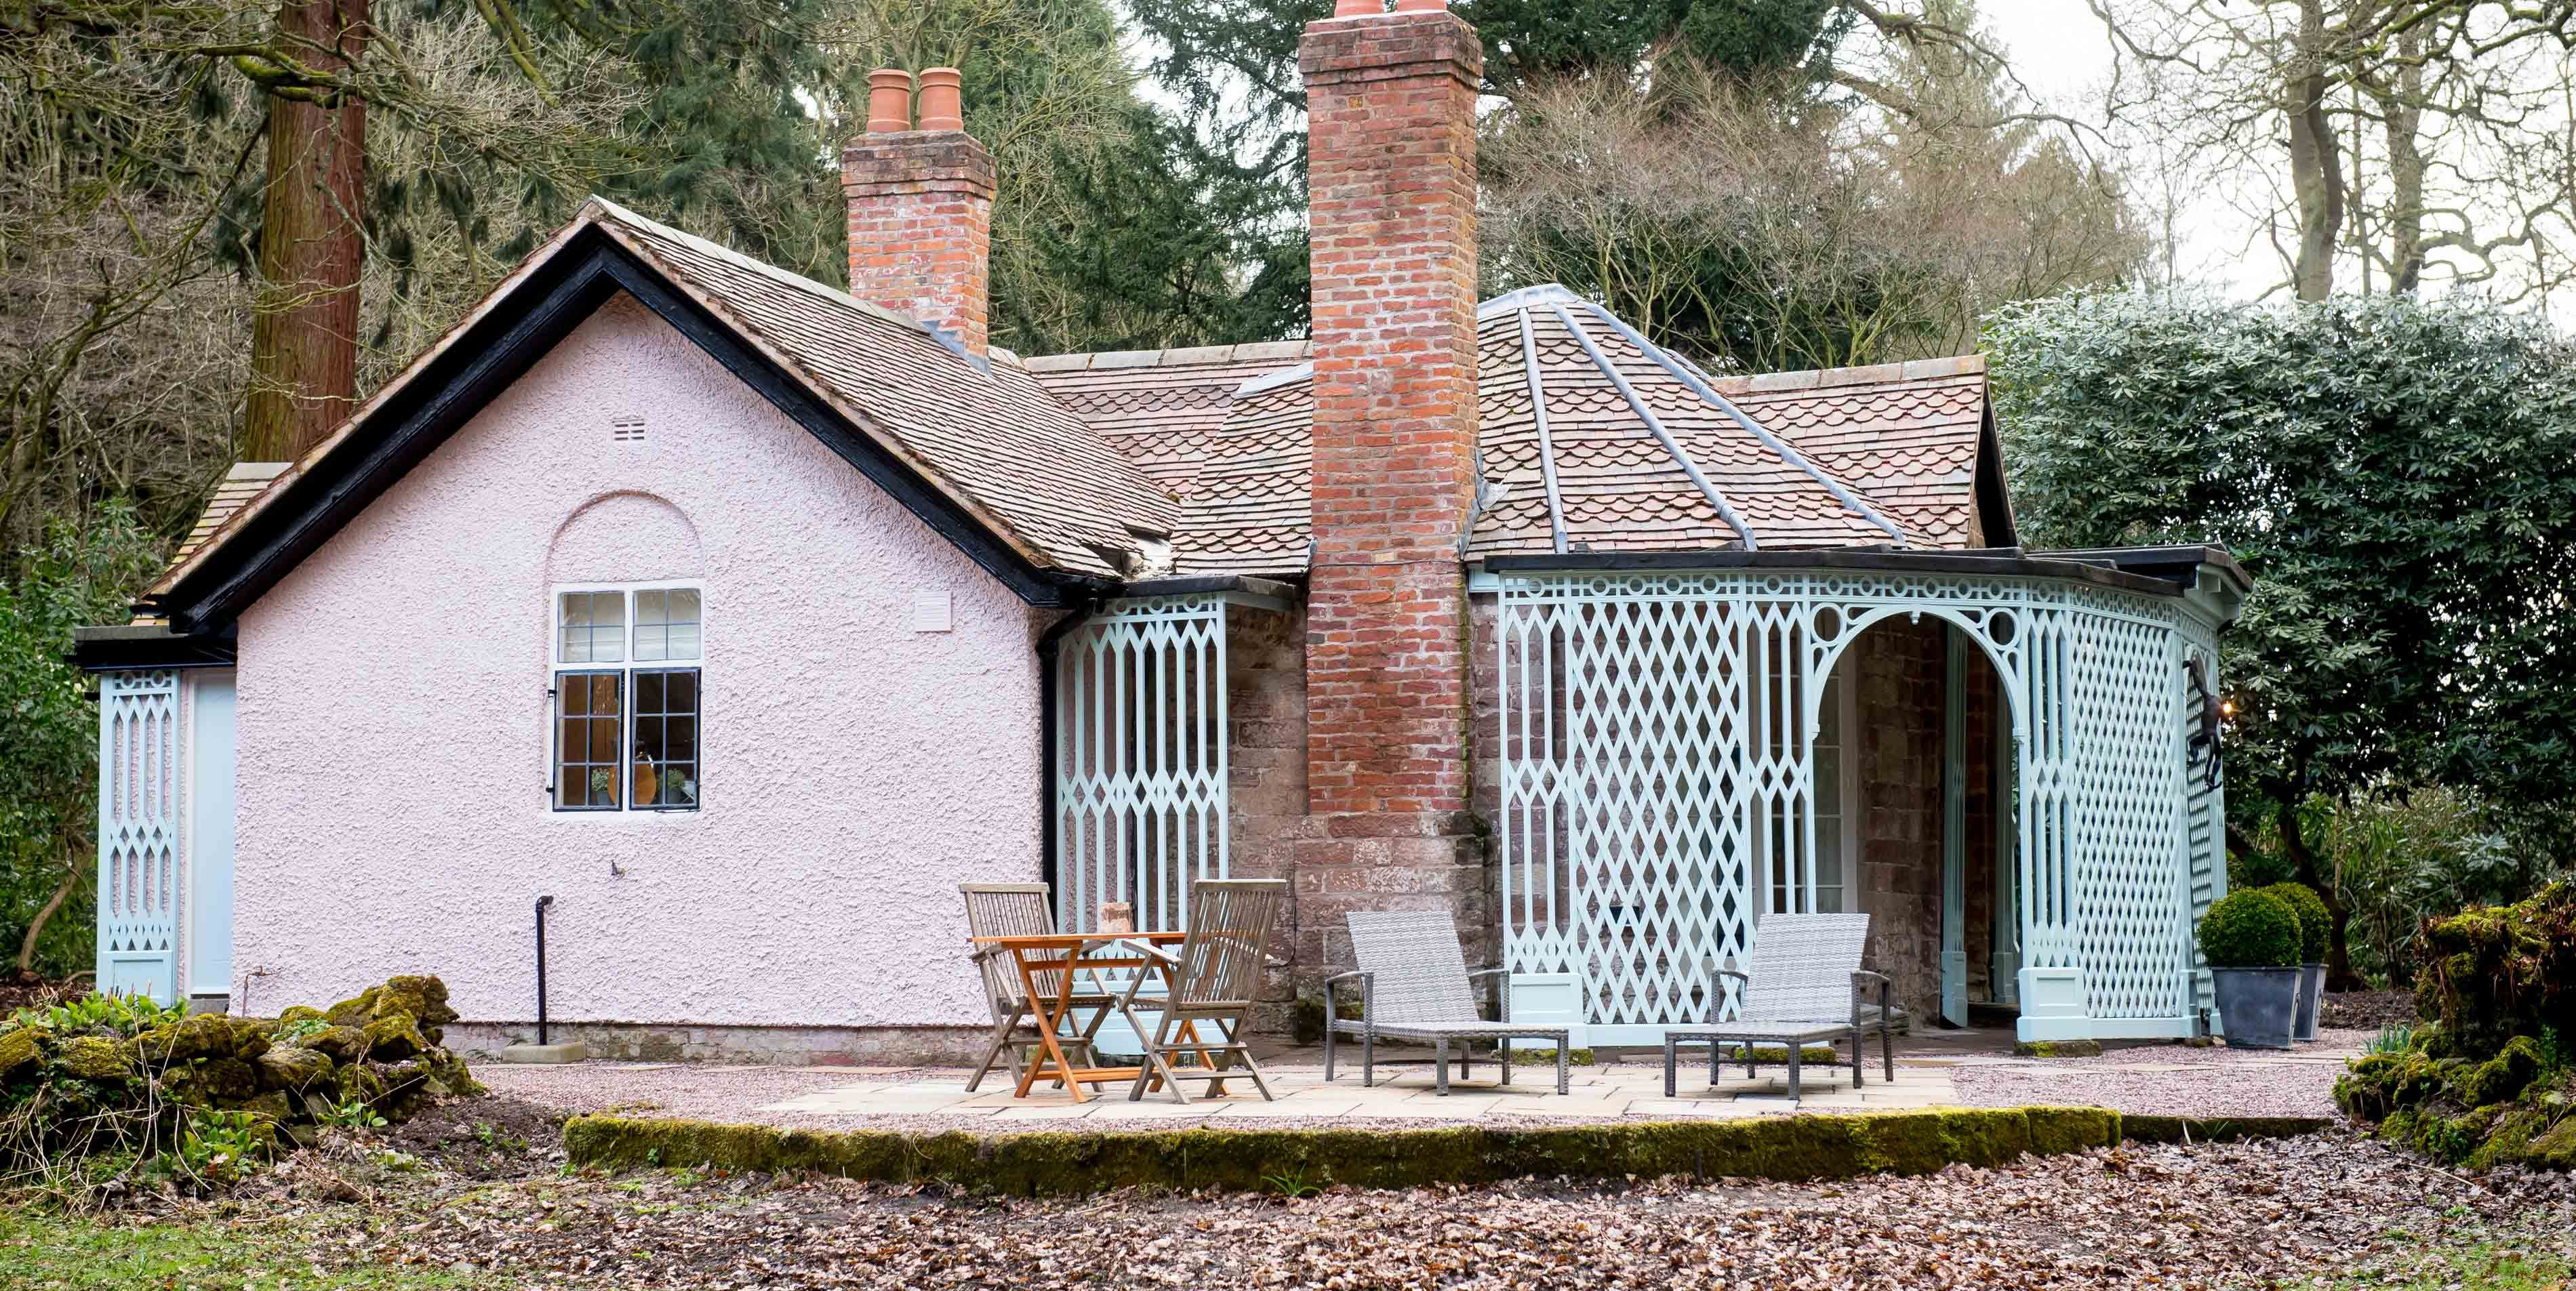 Pink Cottage at Weston Park